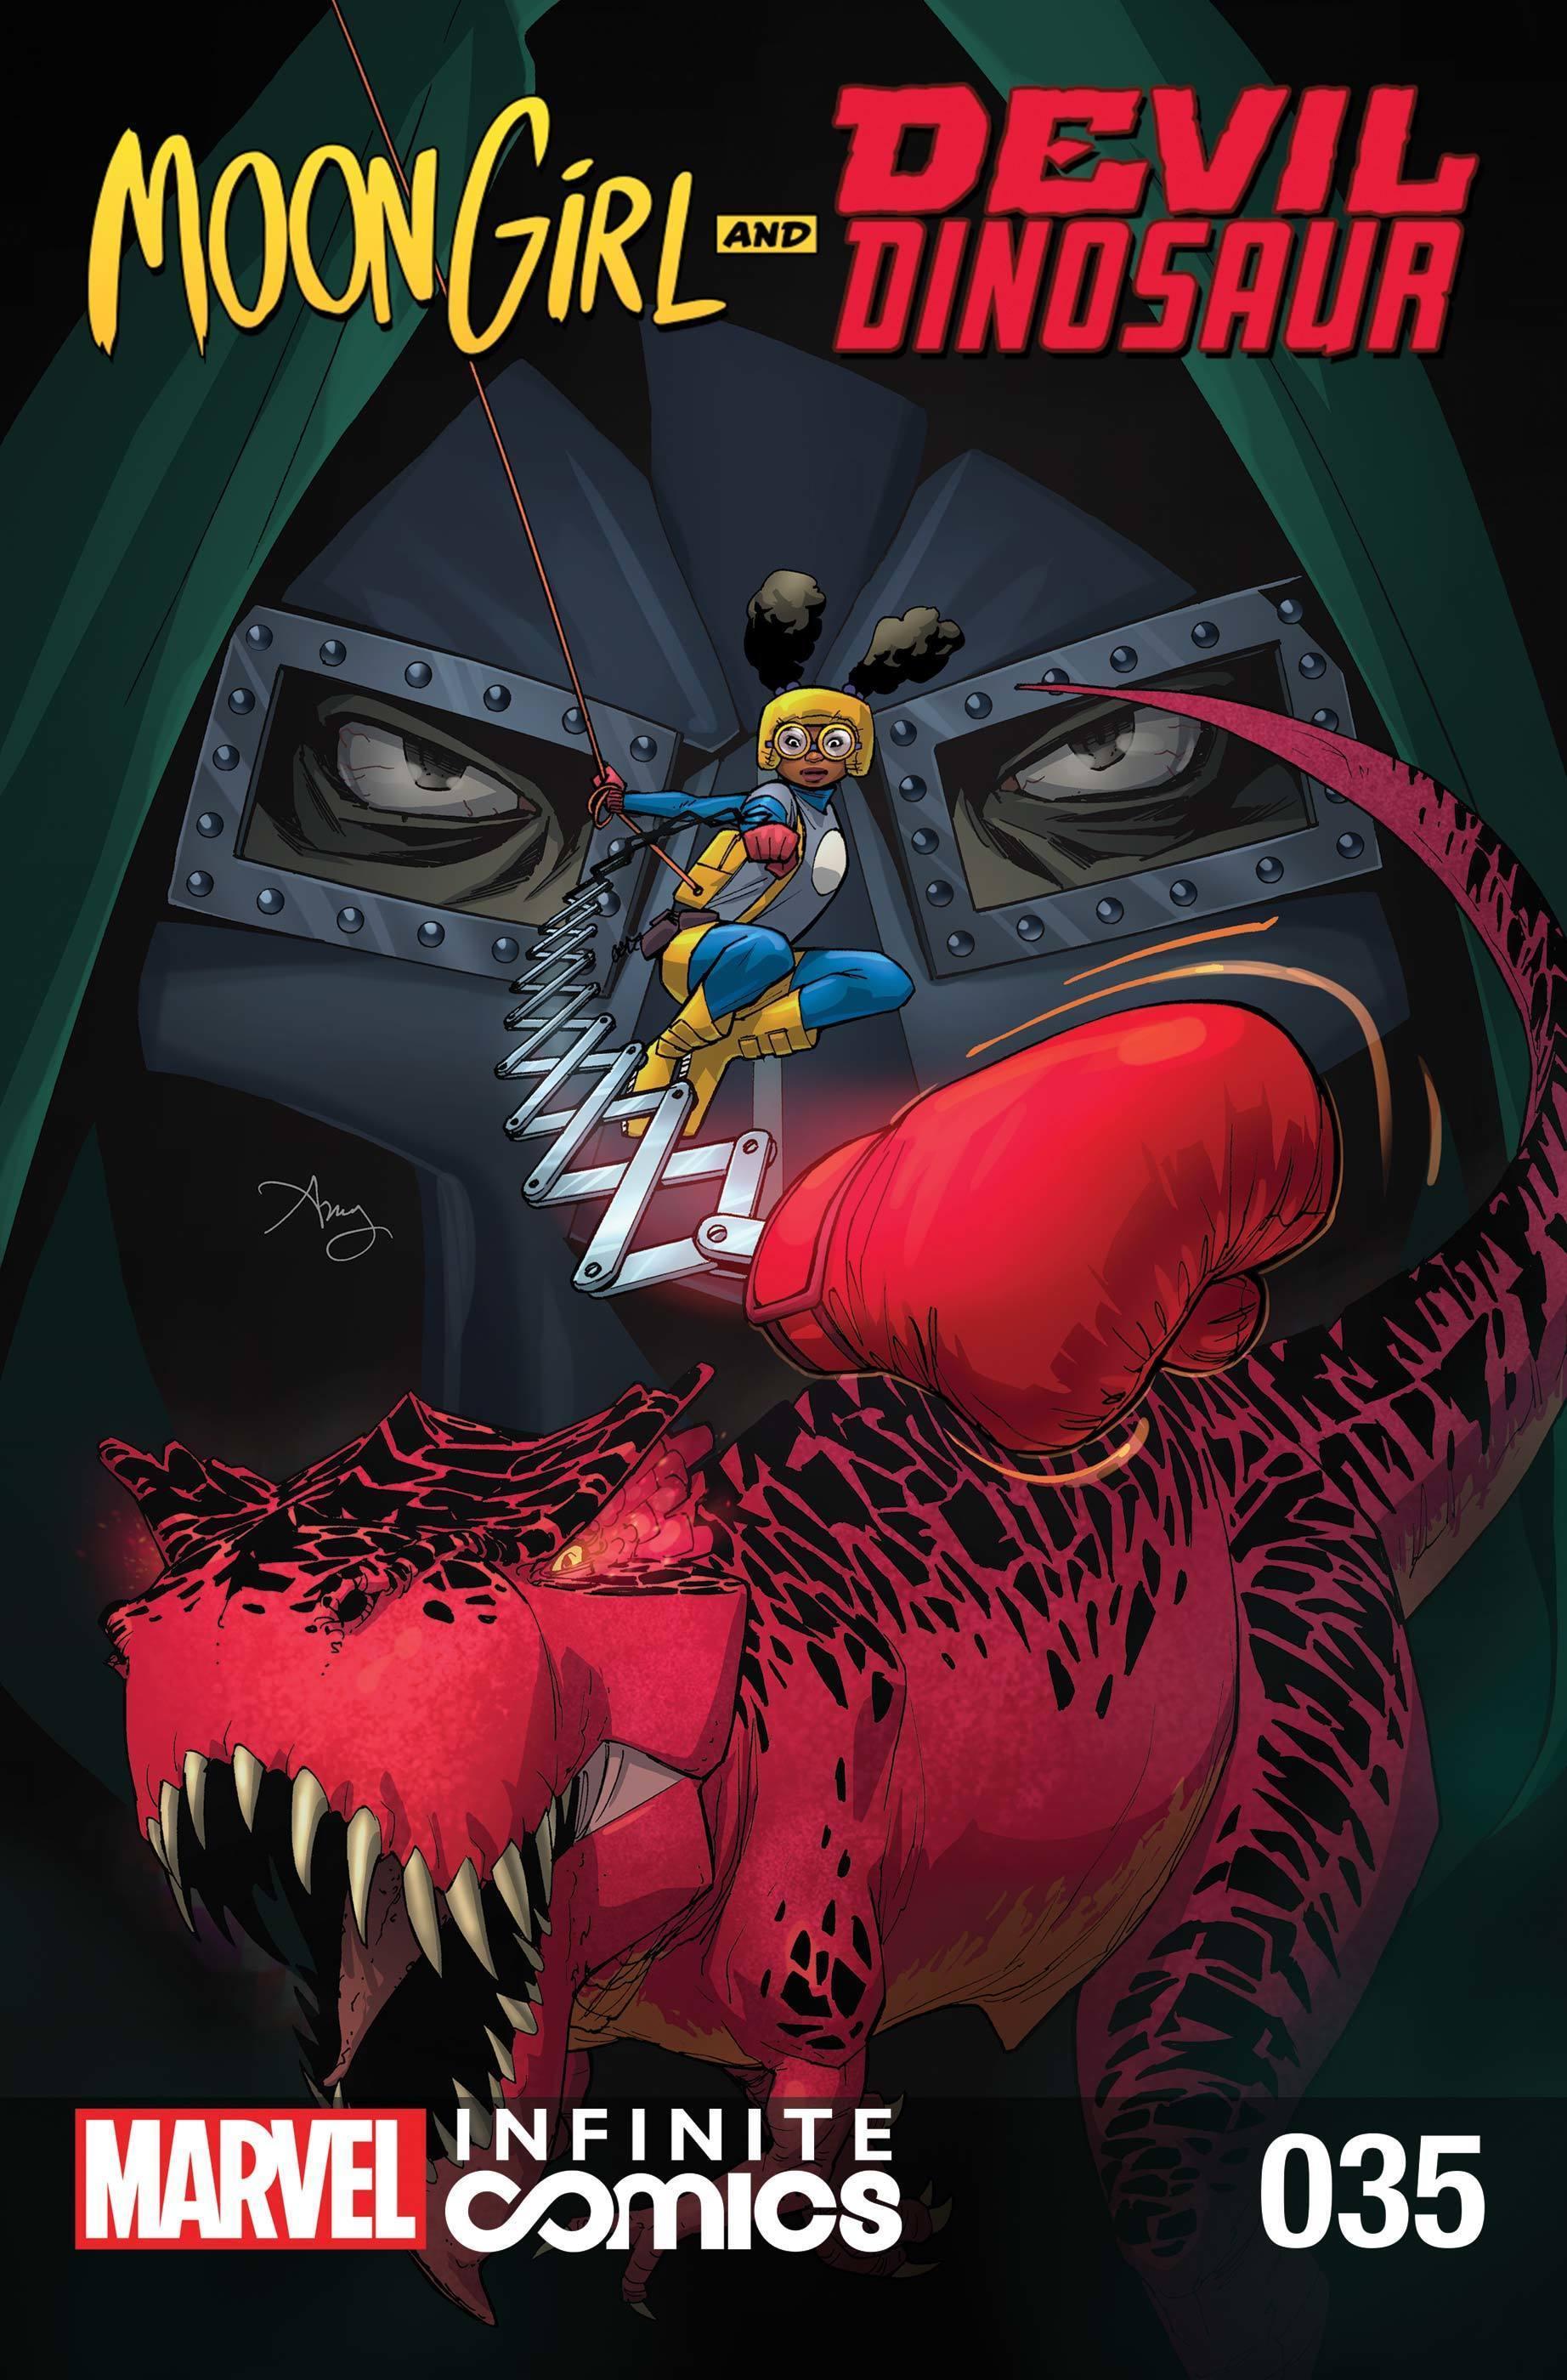 Moon Girl and Devil Dinosaur #35